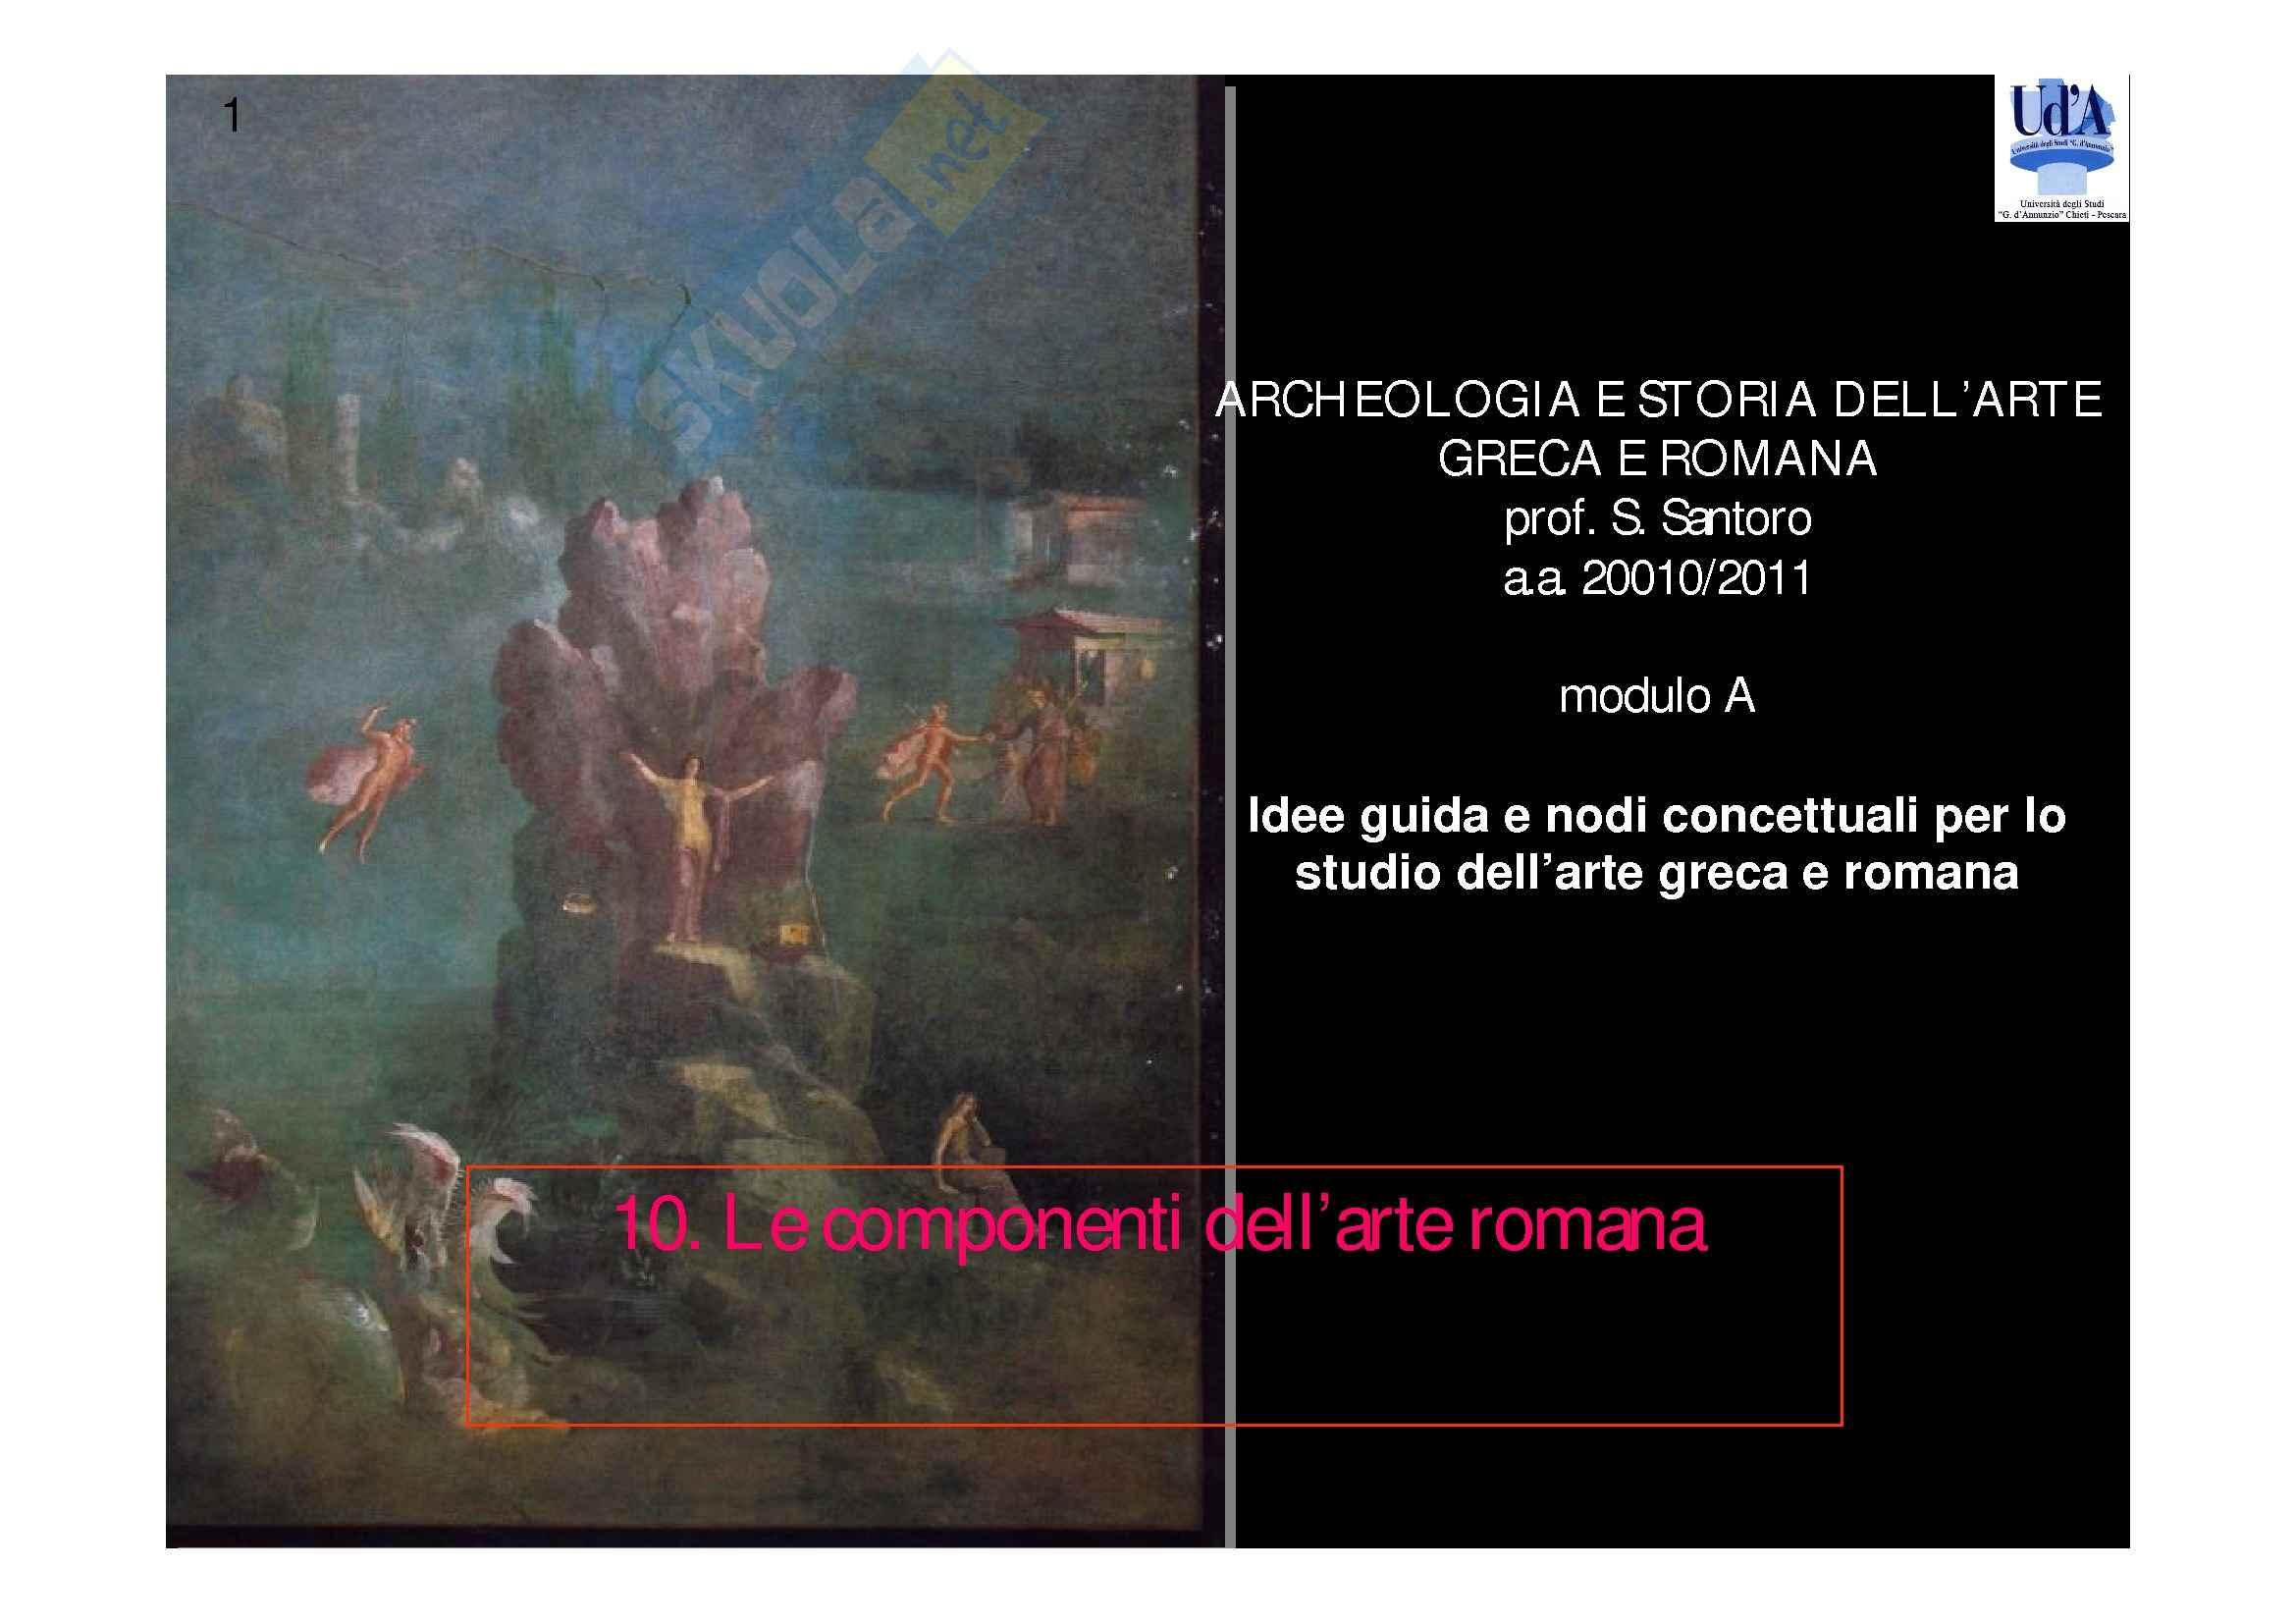 dispensa S. Santoro Archeologia e storia dell'arte greca e romana mod.A